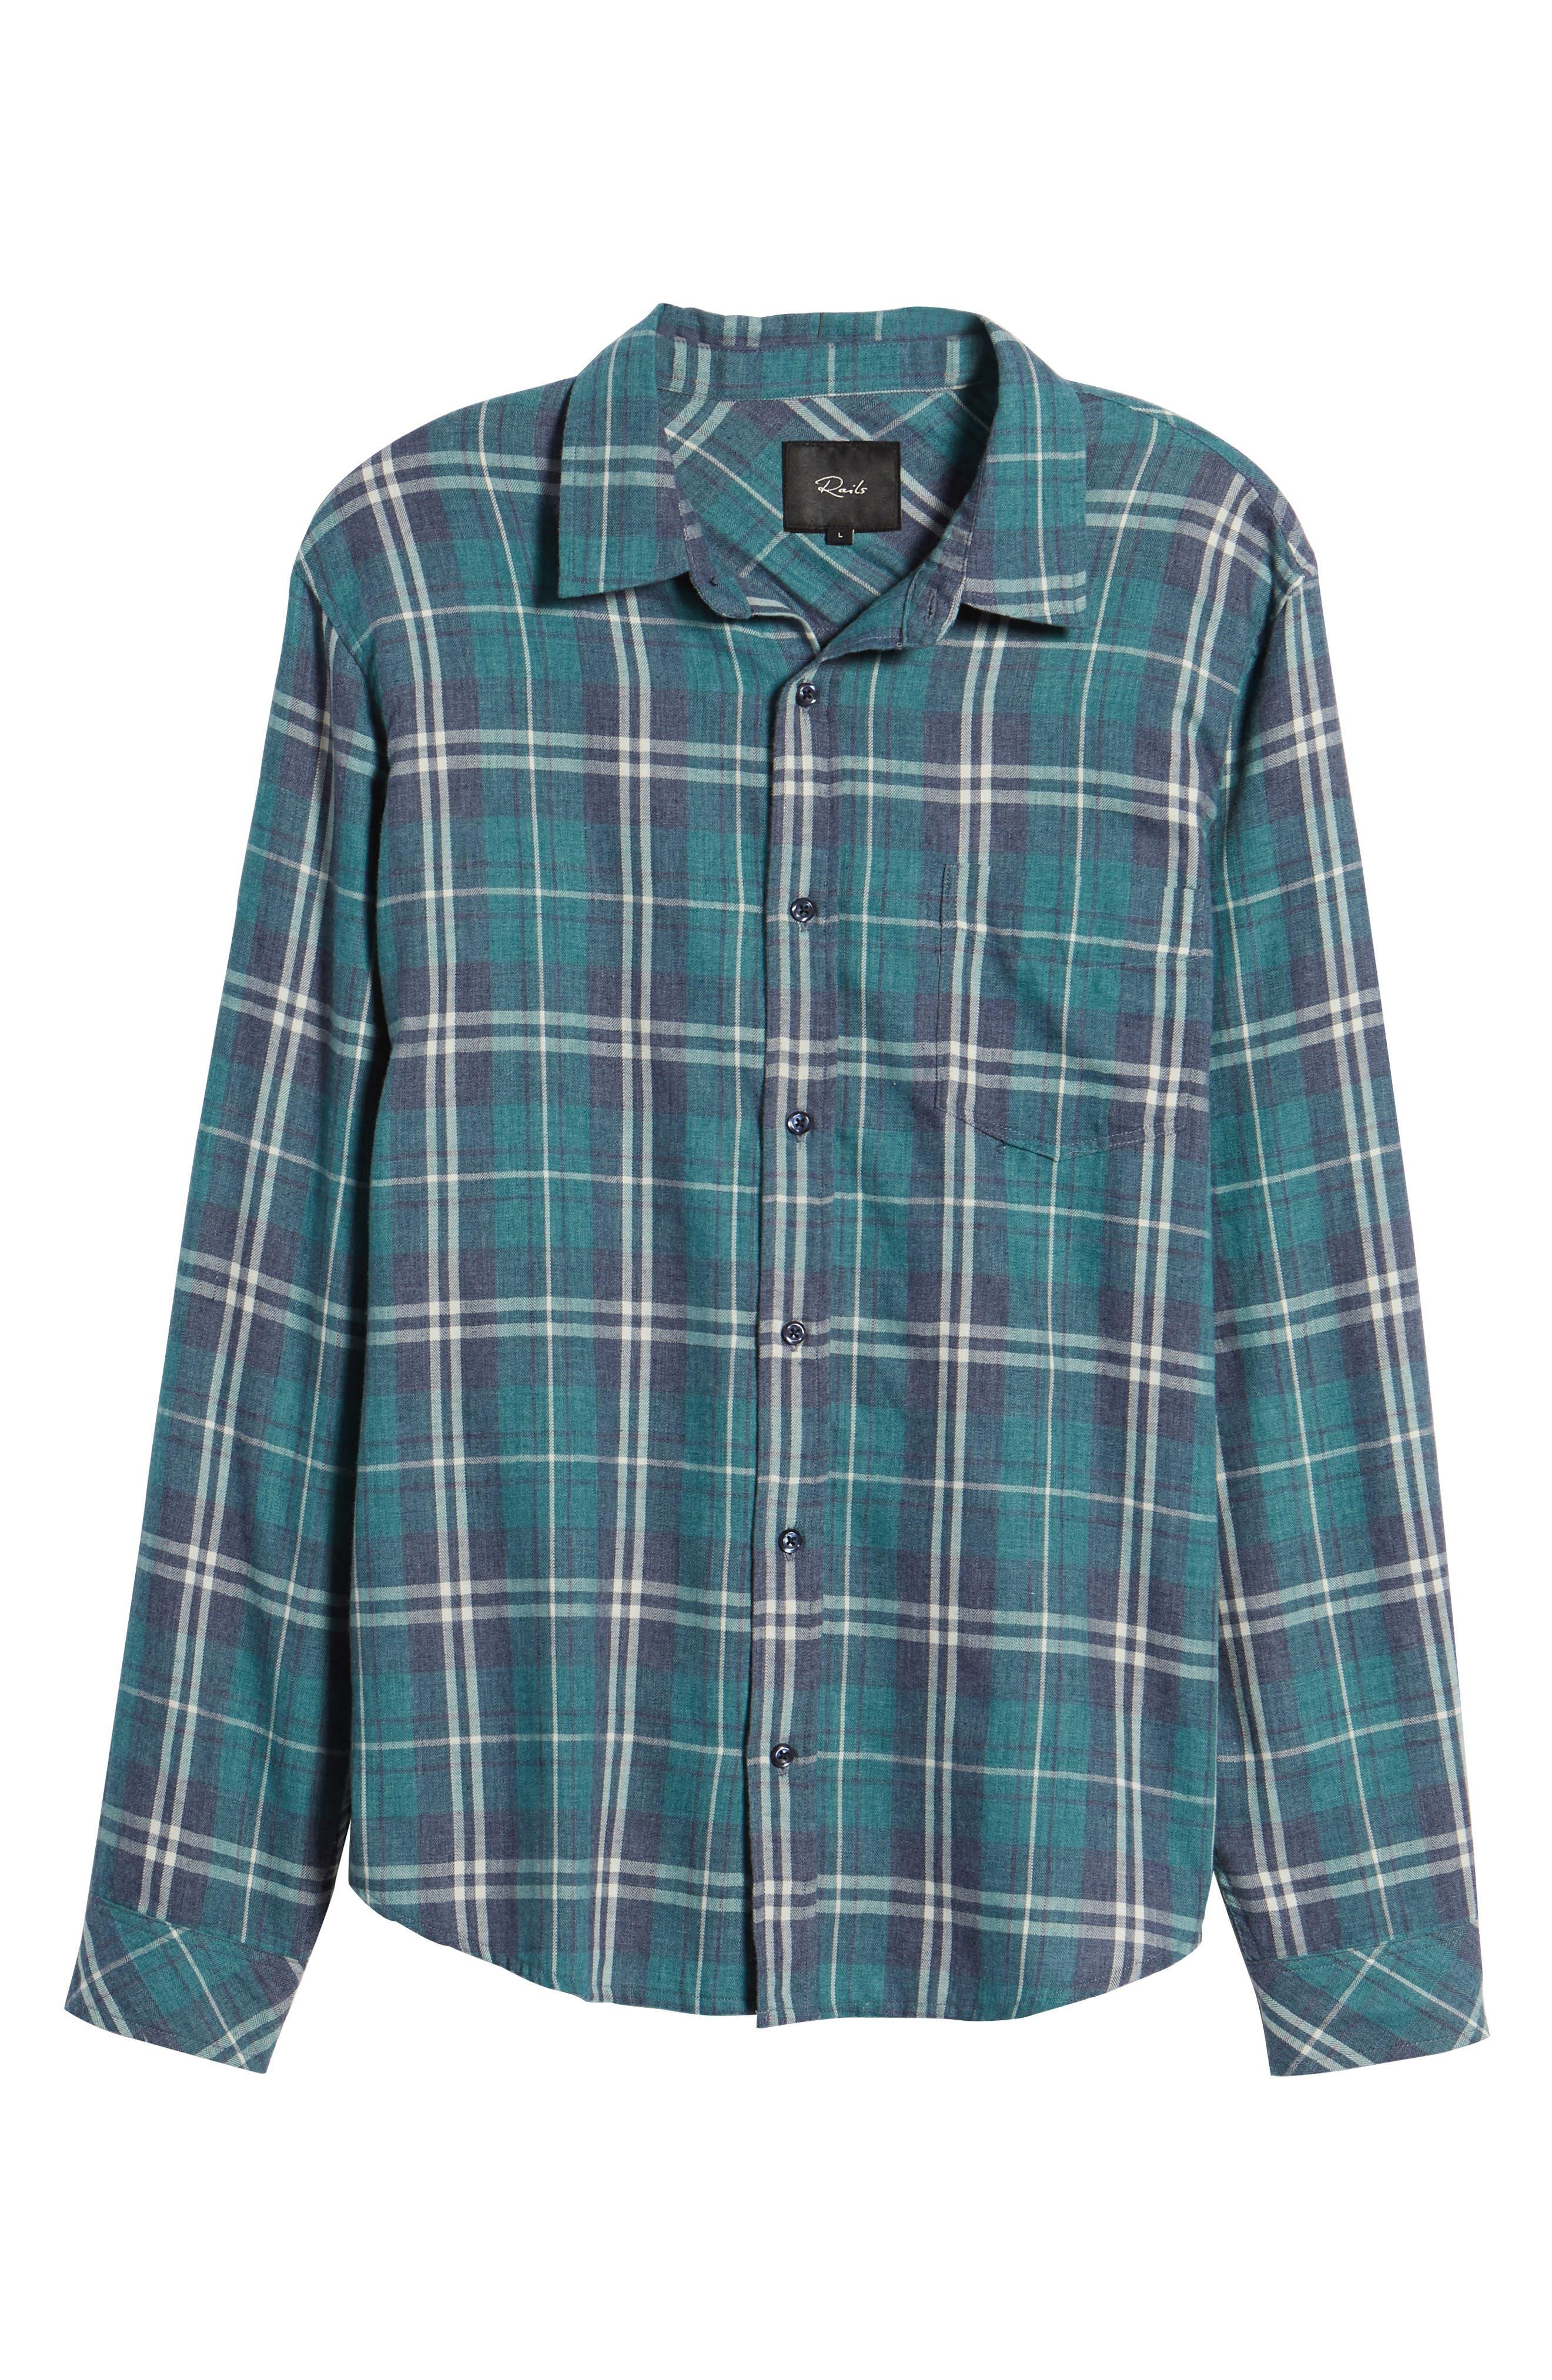 Lennox Slim Fit Plaid Woven Shirt,                             Alternate thumbnail 6, color,                             Veridian Navy White